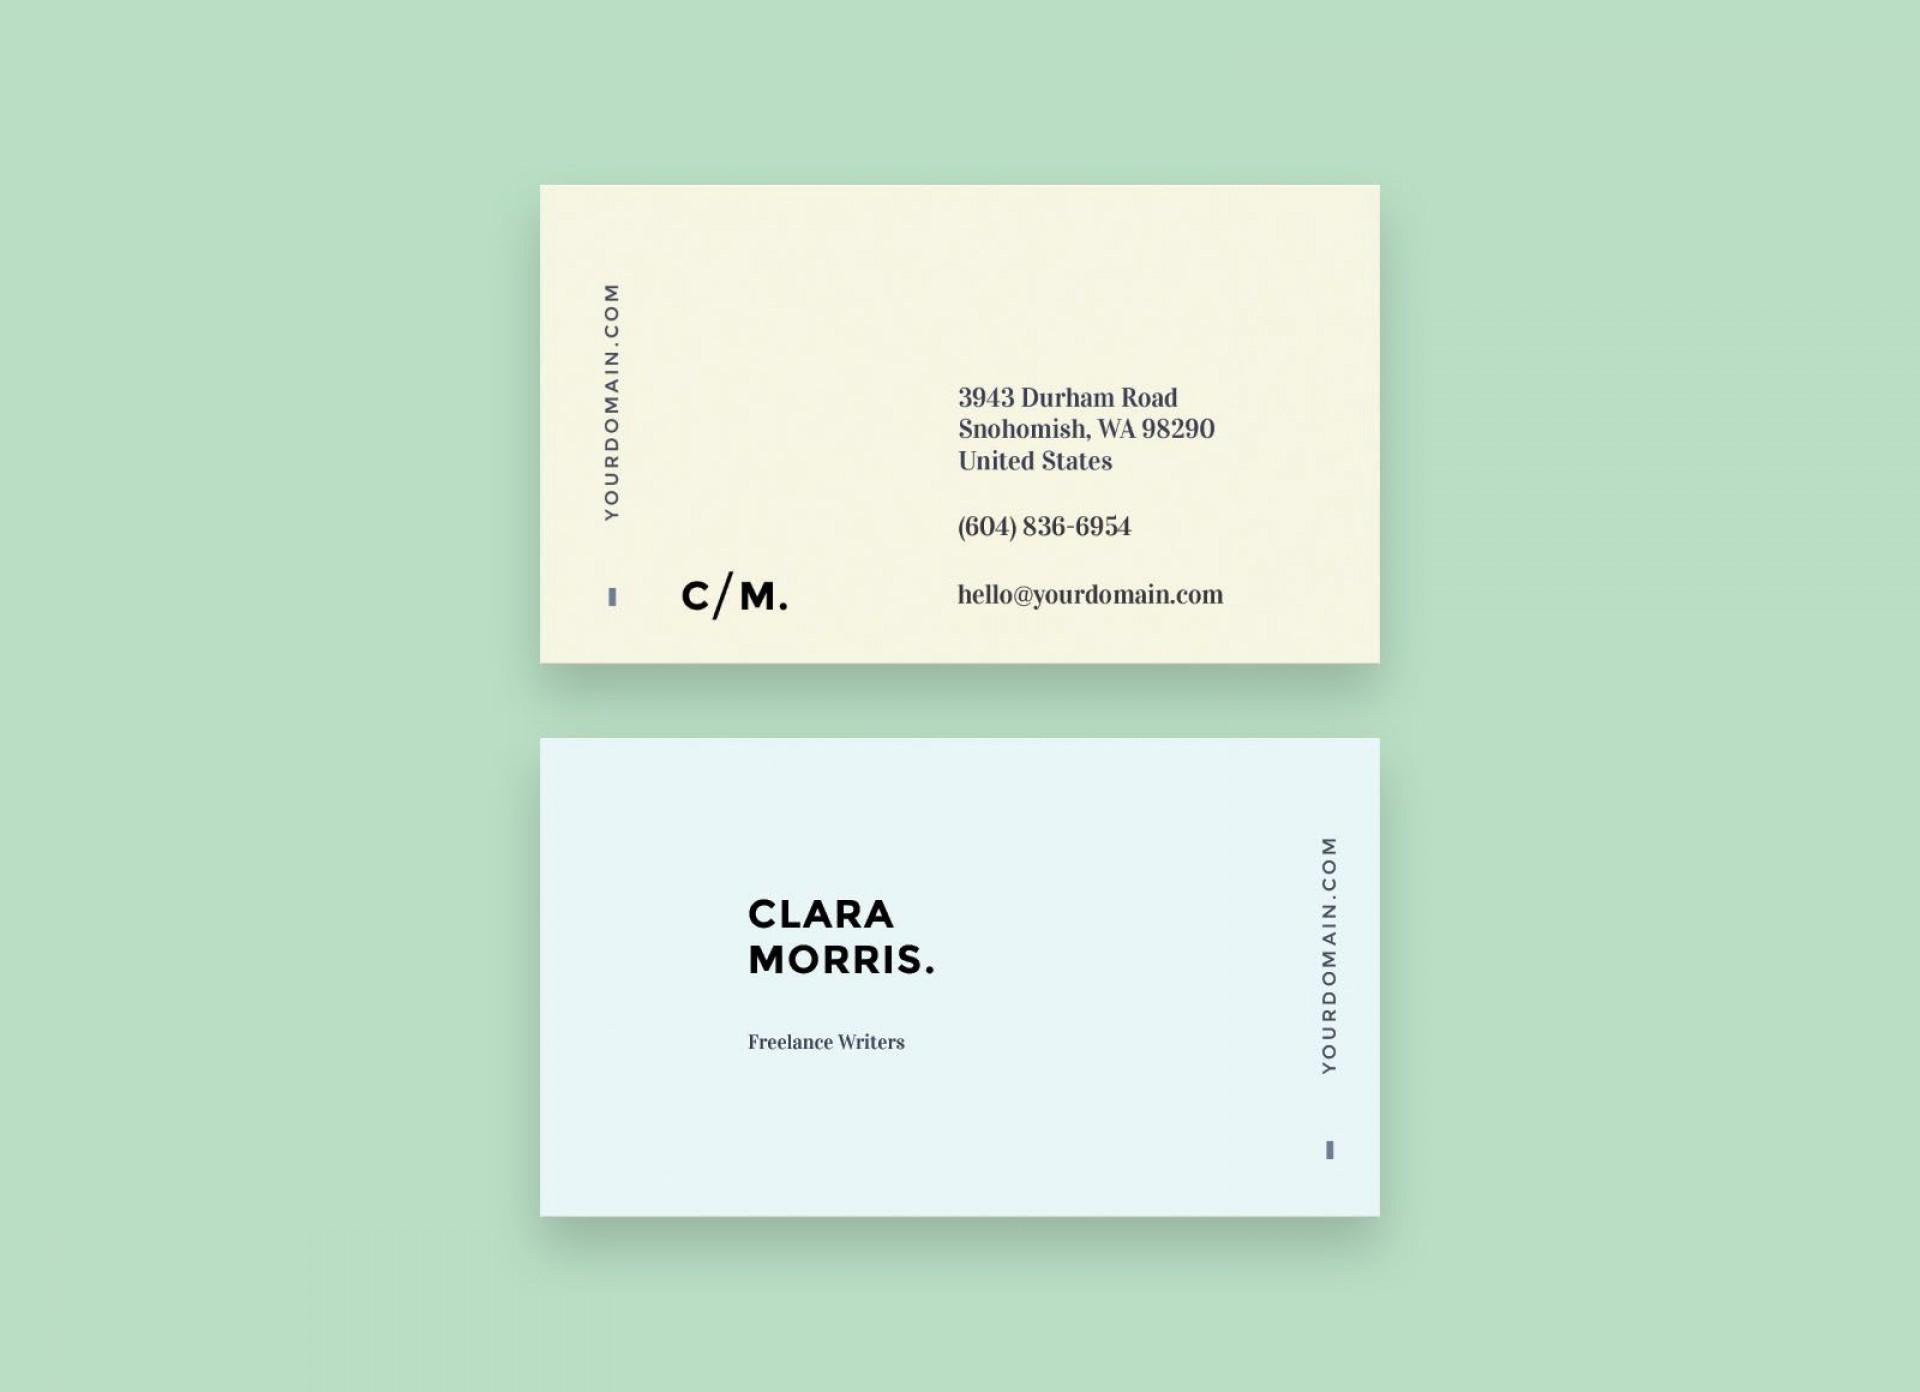 006 Excellent Minimalist Busines Card Template Free Sample  Minimal Psd1920